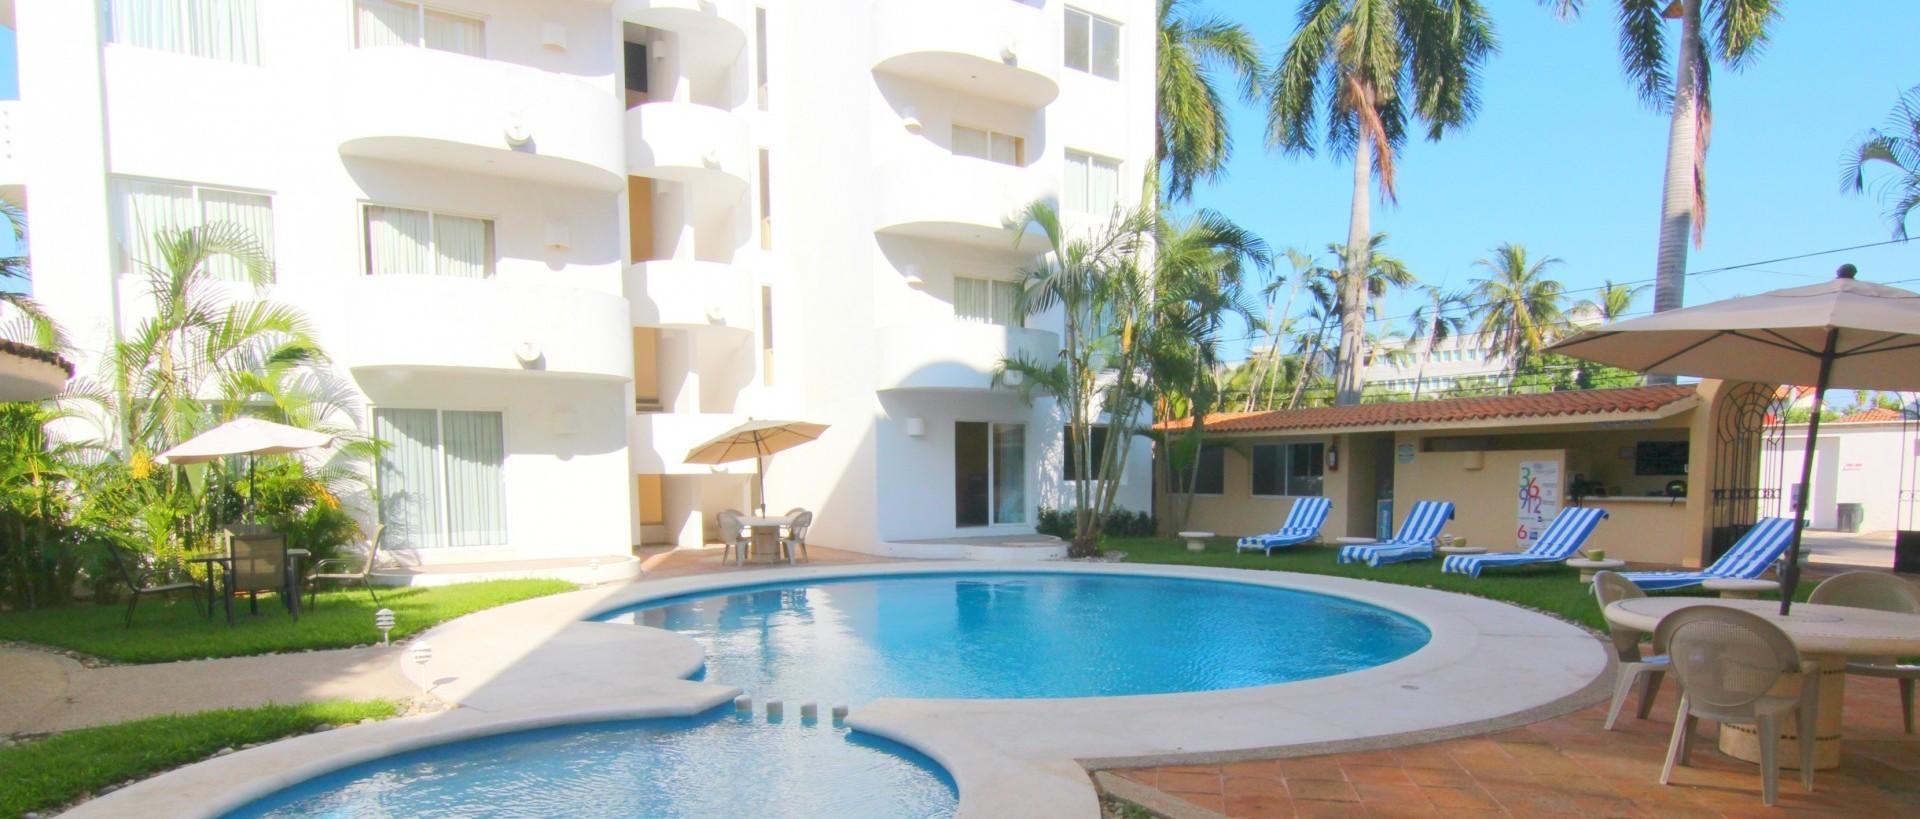 Panoramica del hotel Villamar Princesa Suites